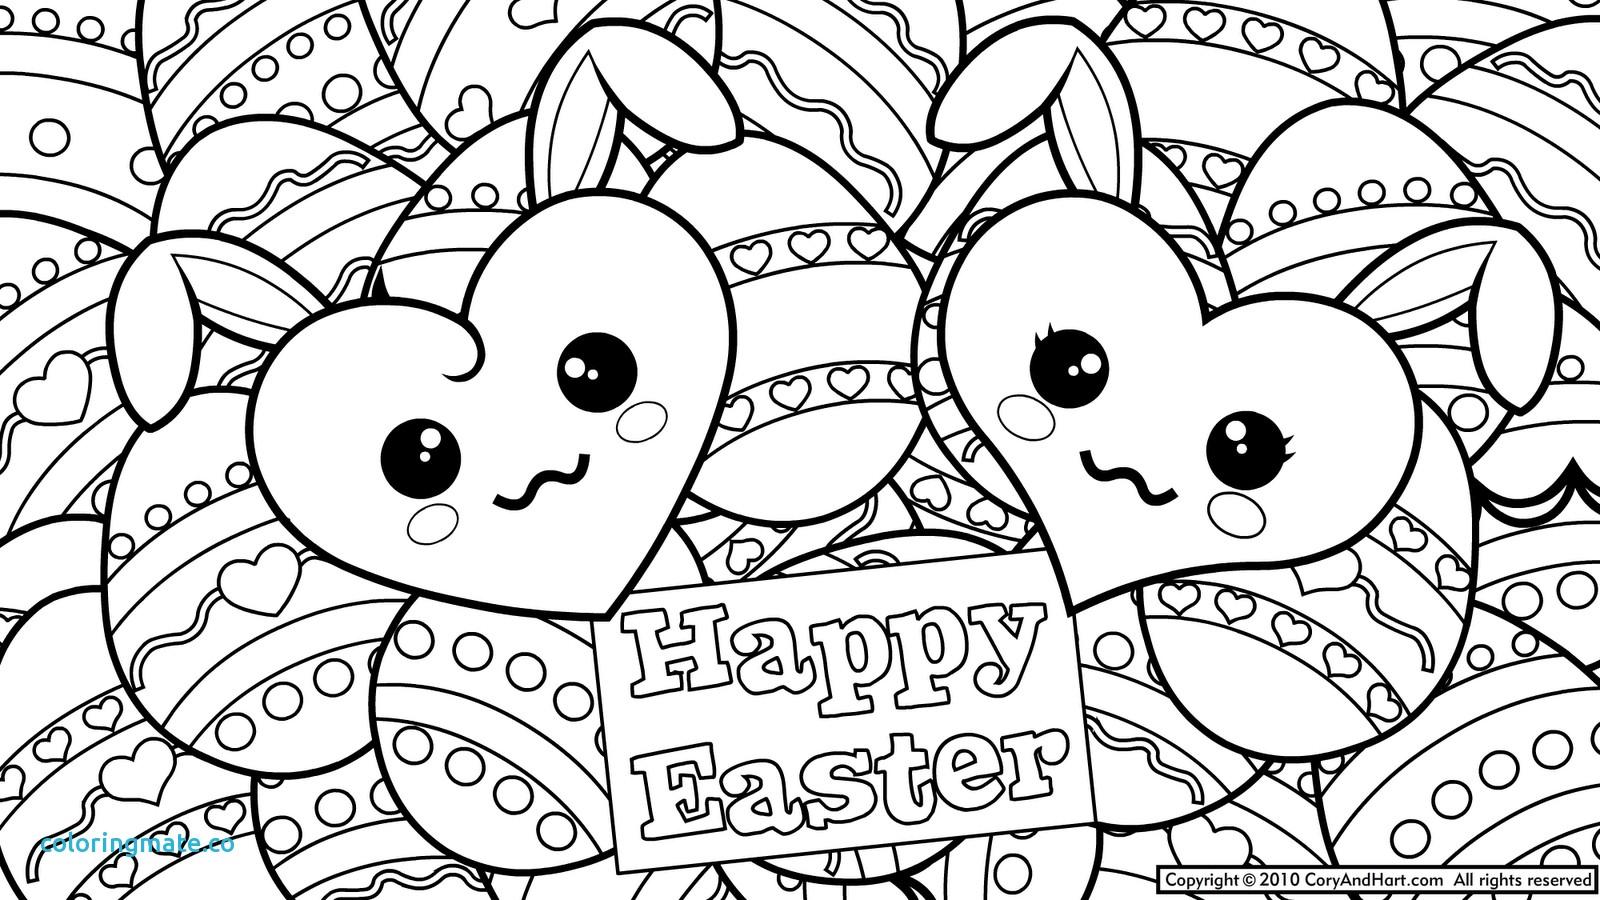 Kawaii Panda Drawing at GetDrawings.com | Free for personal use ...